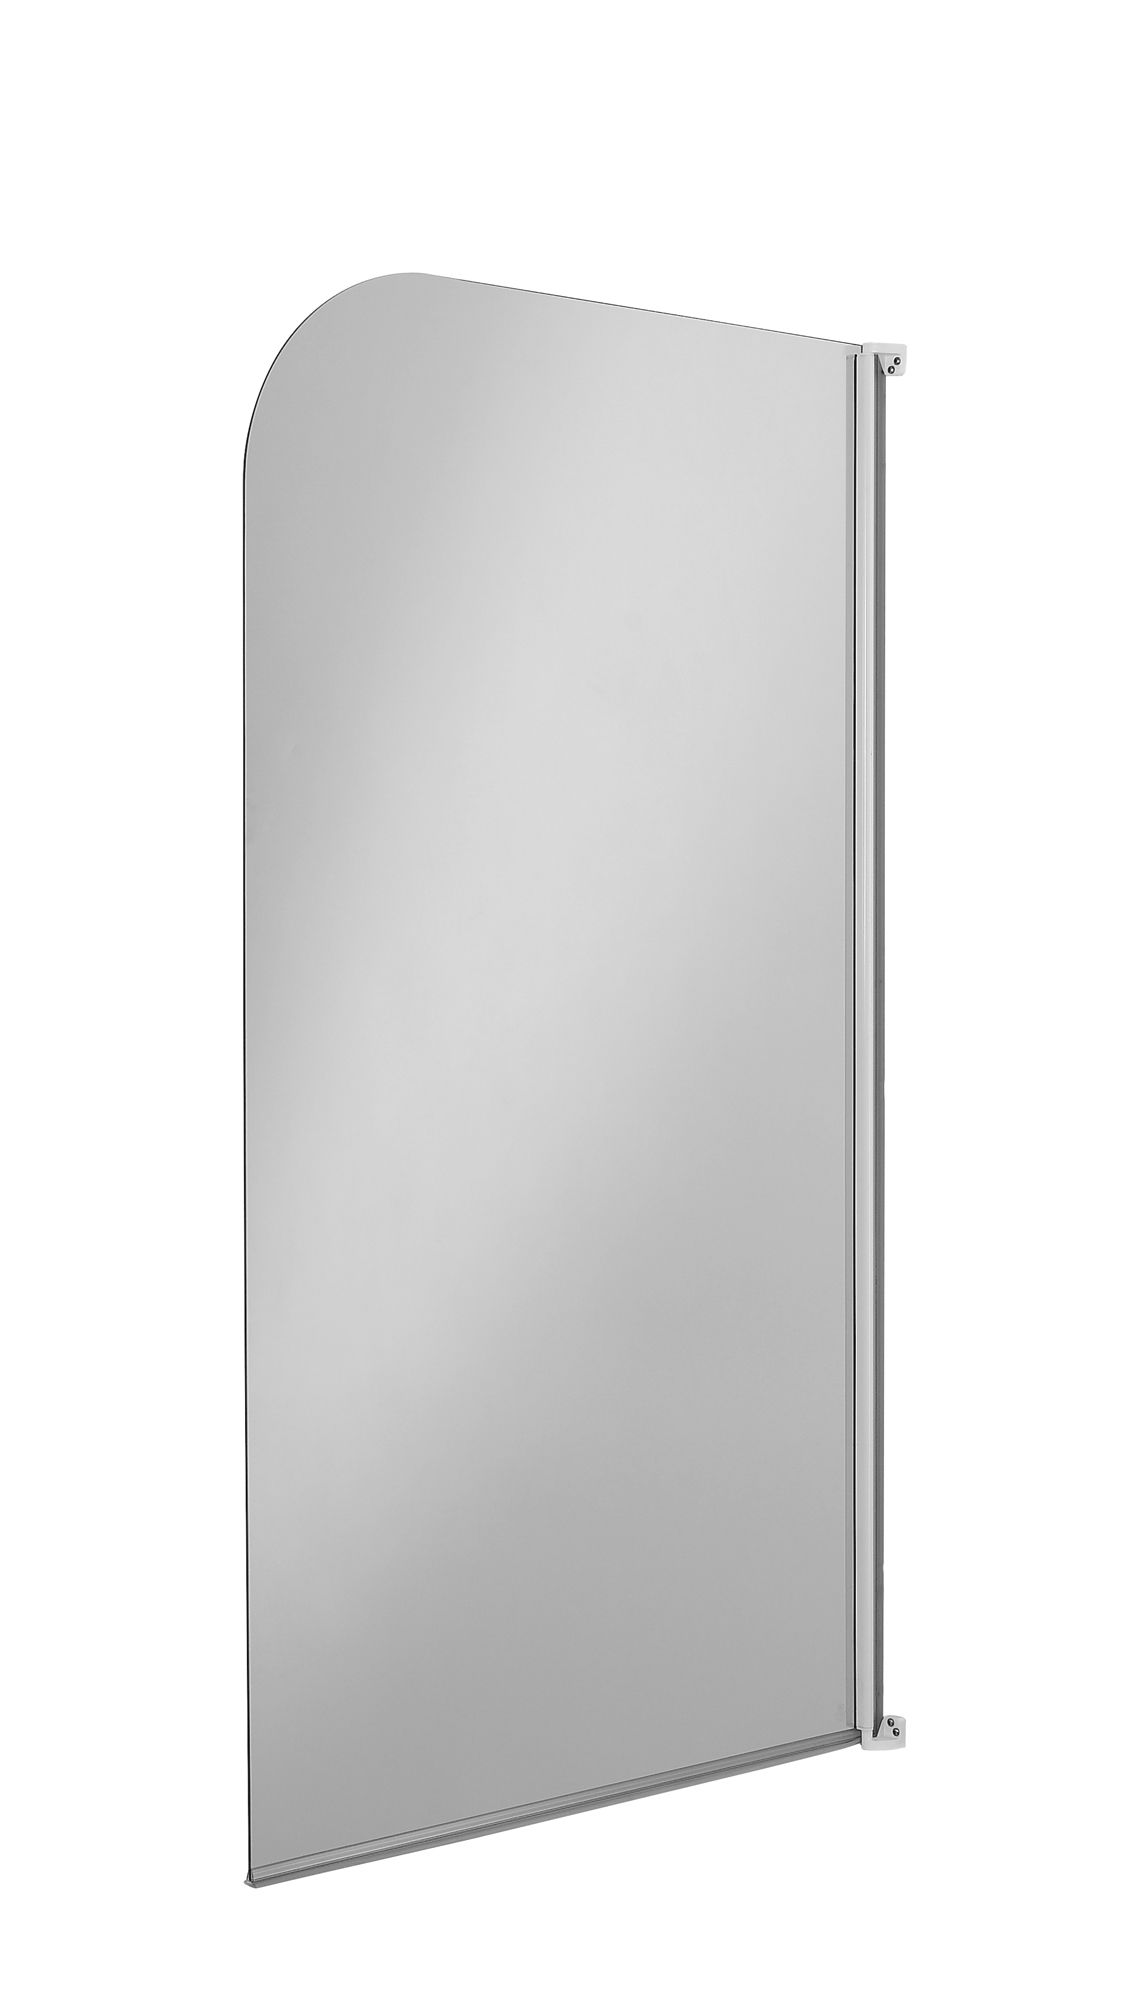 B Q Bathroom Wall Boards Thedancingpa Com